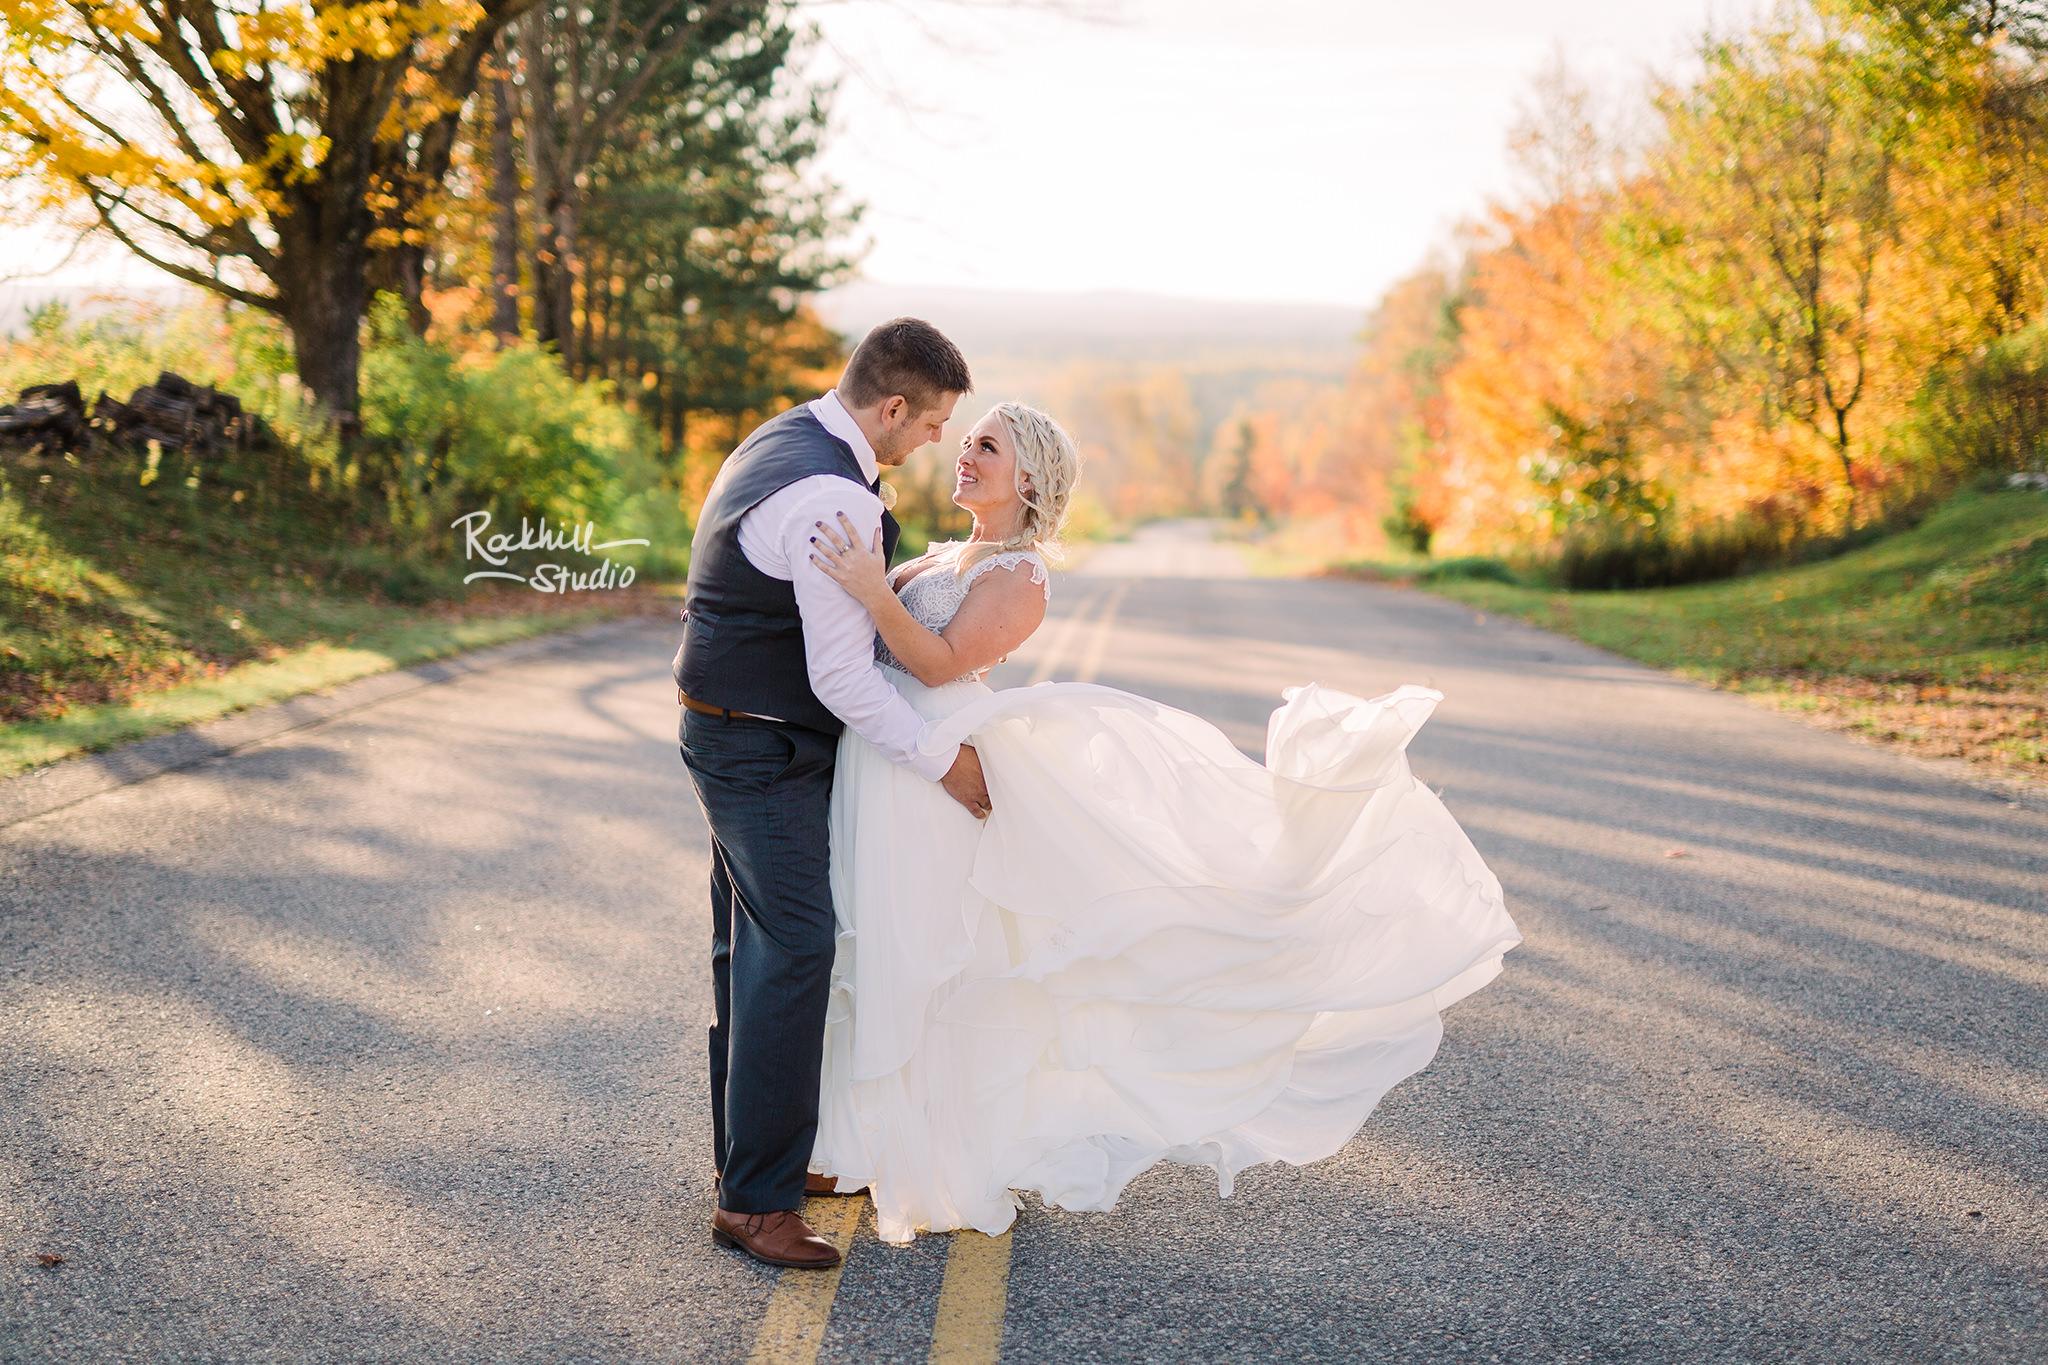 Traverse city wedding photography bride and groom 1